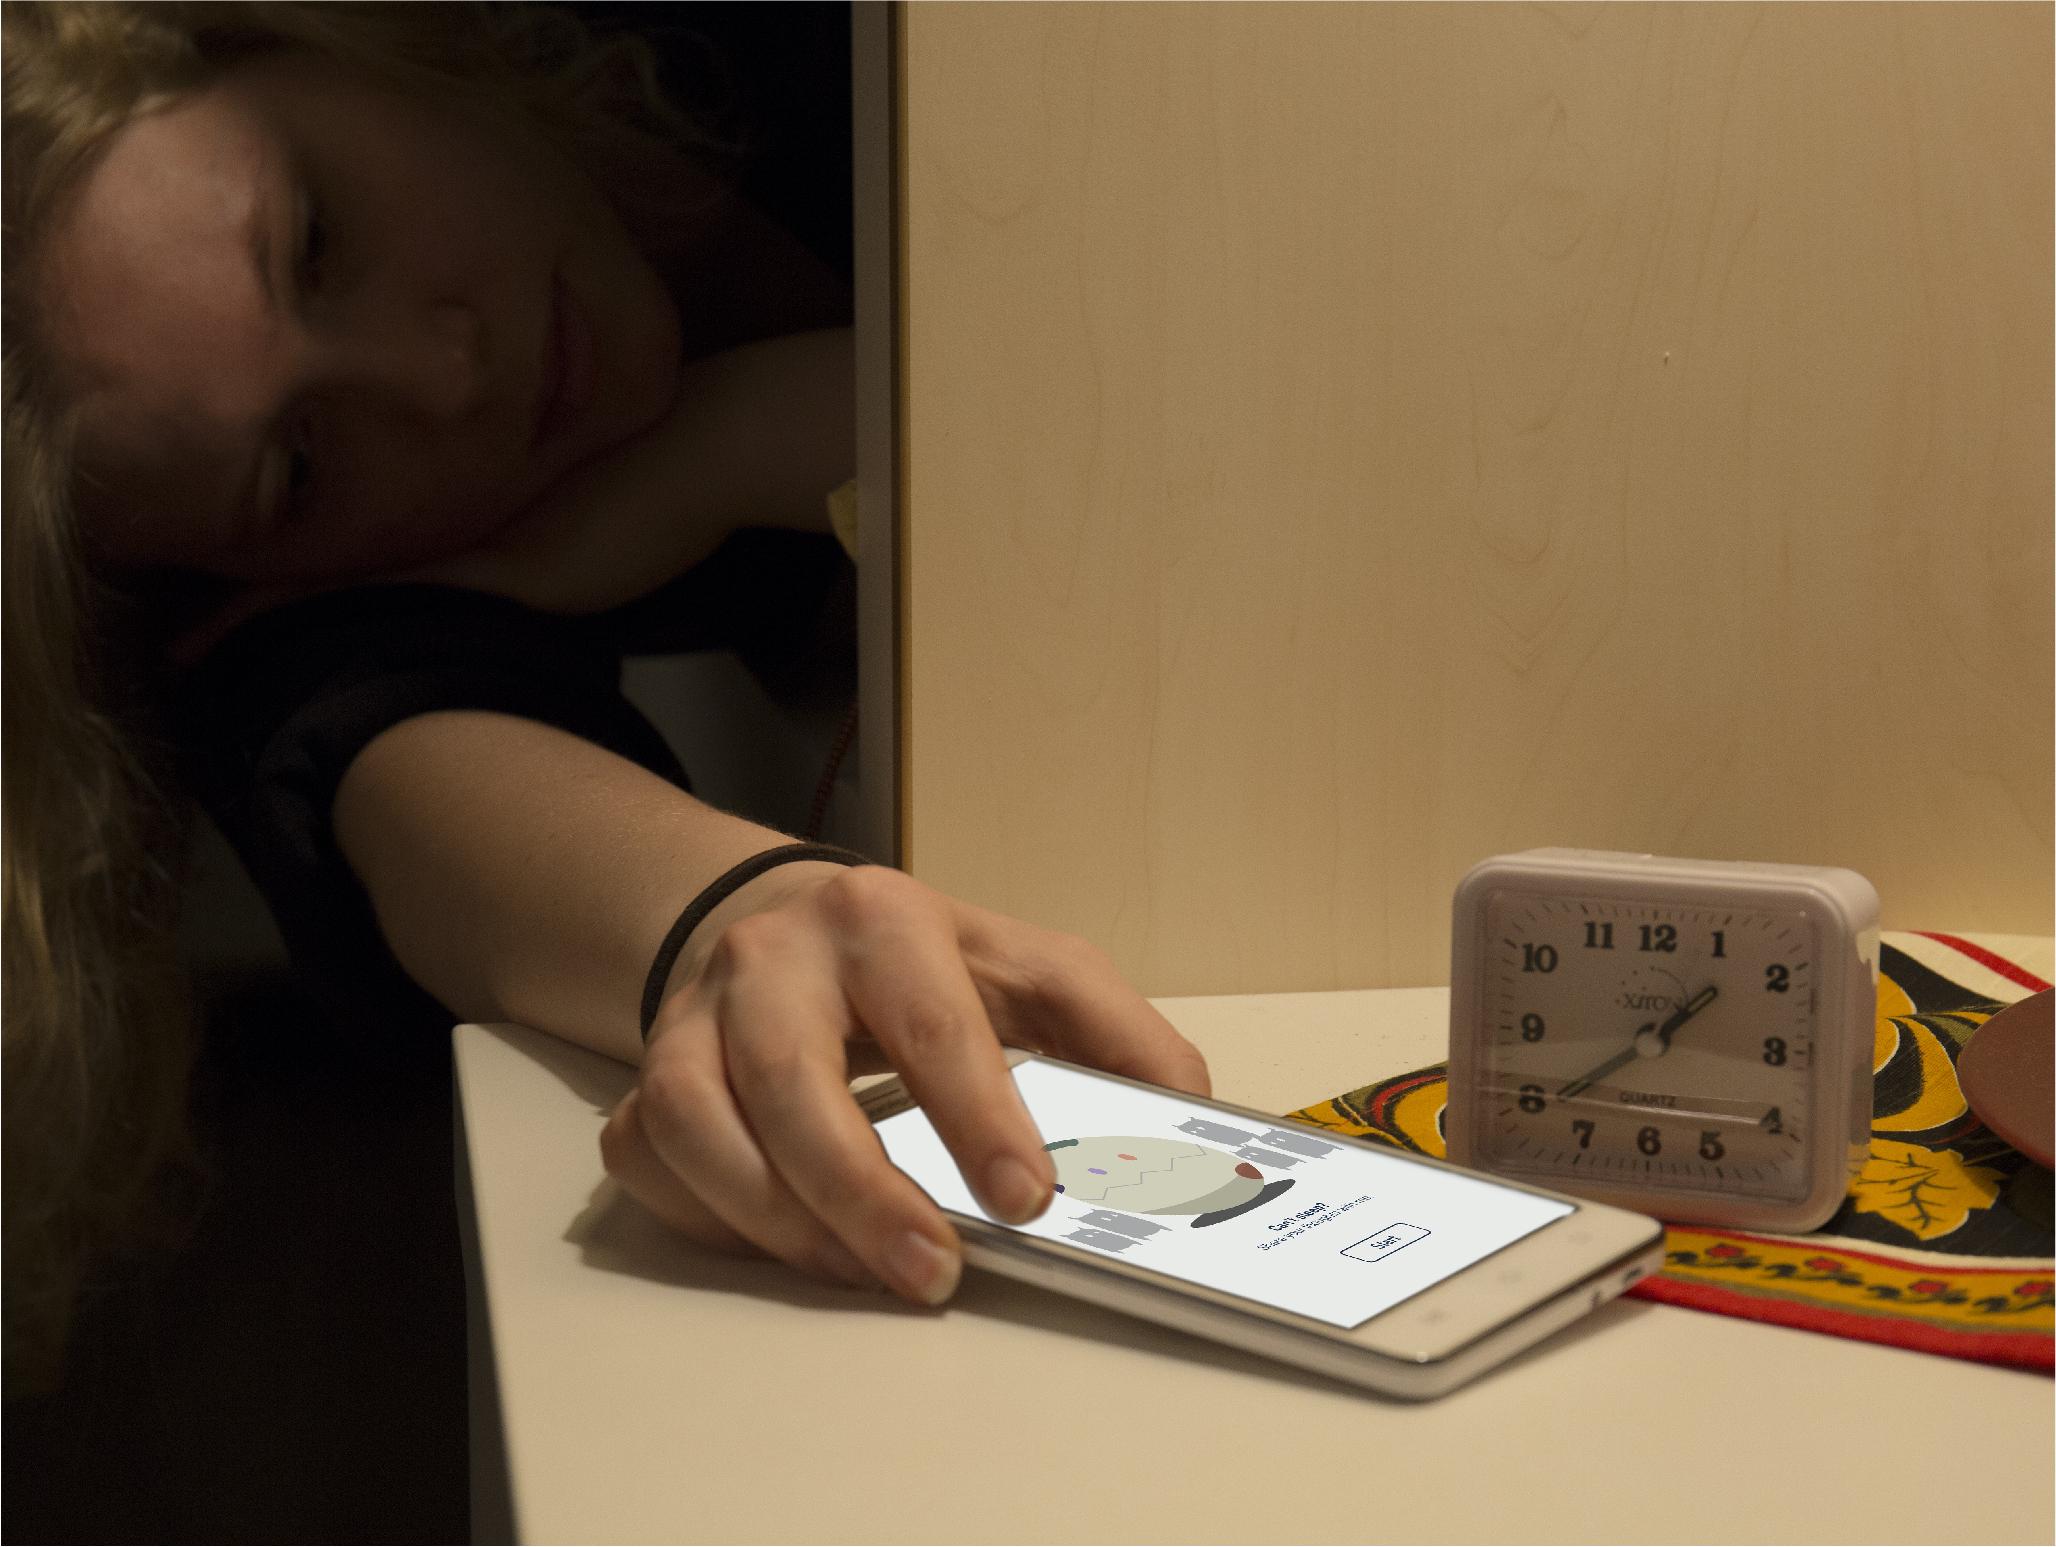 Rummi - digital sleep diary for insomnia people    Read more